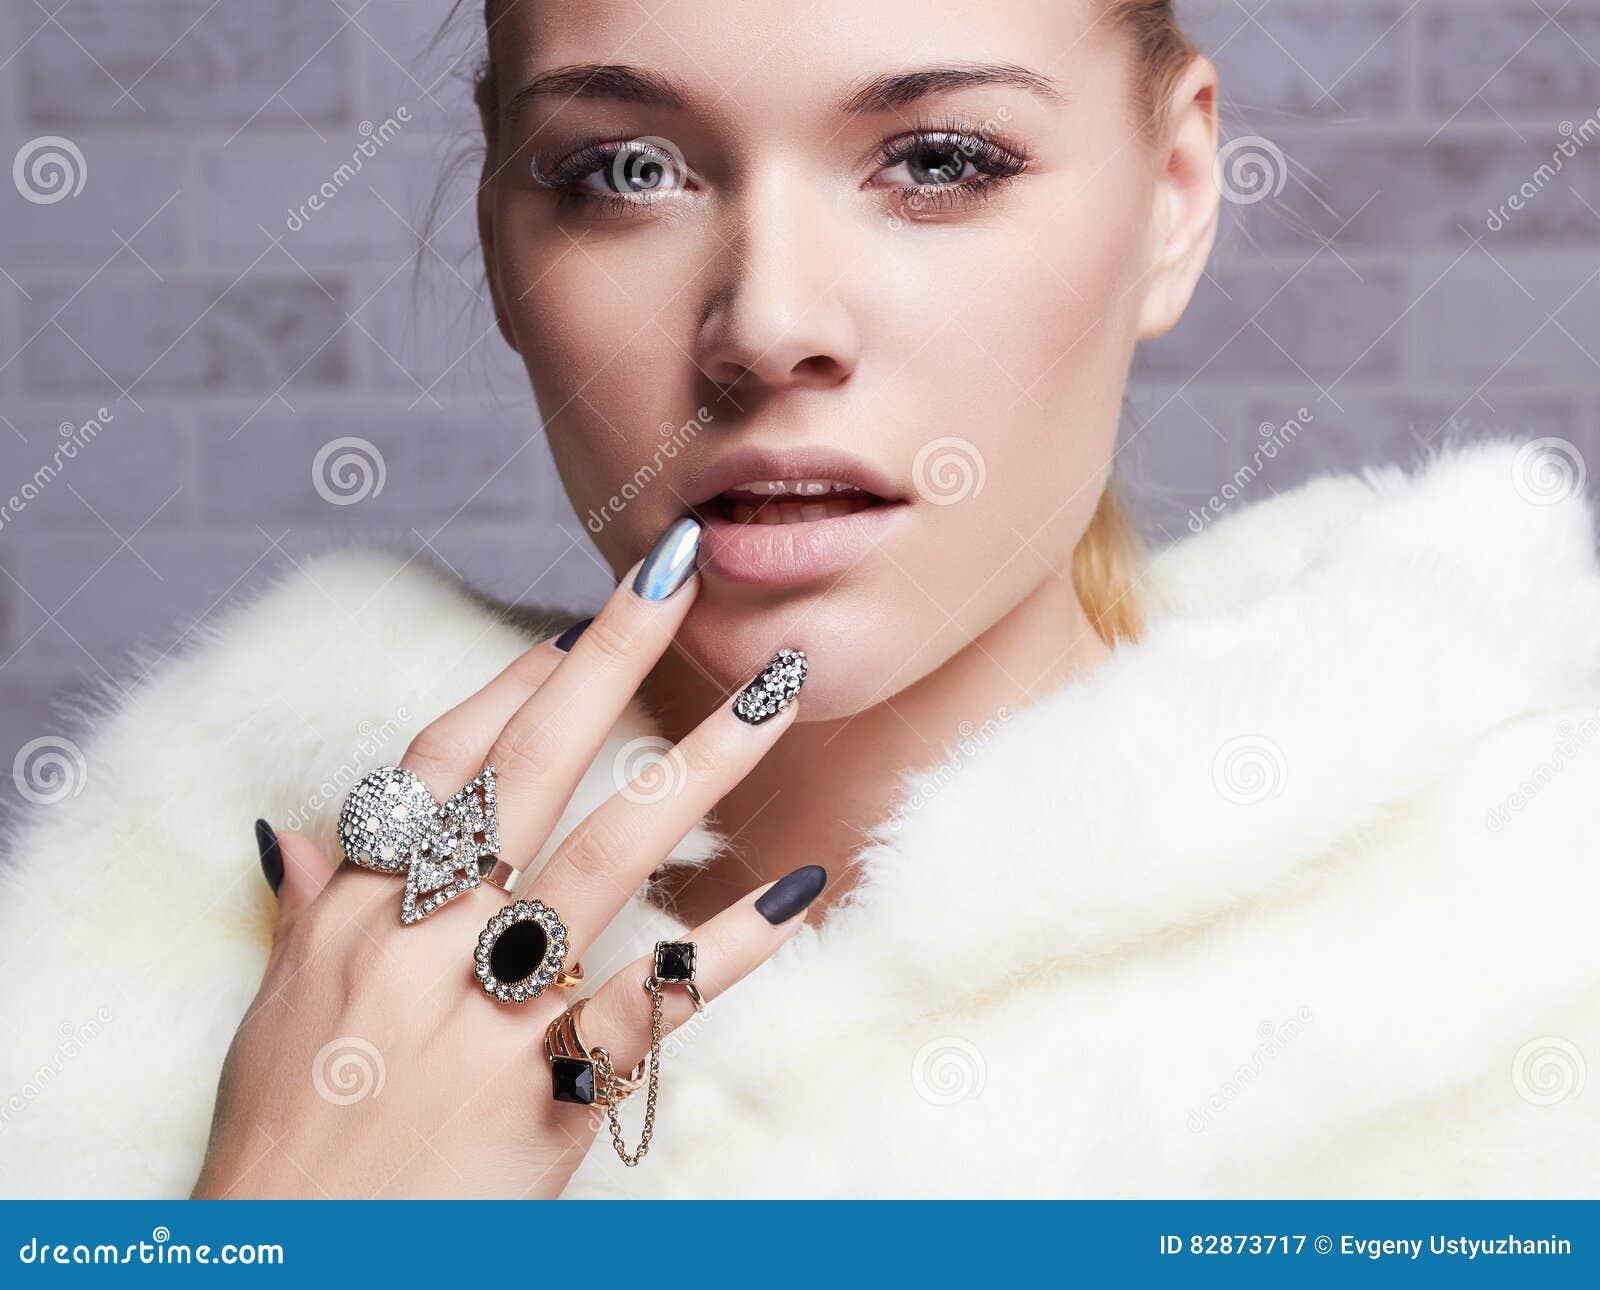 Jewelry On Fur Stock Photo 349866